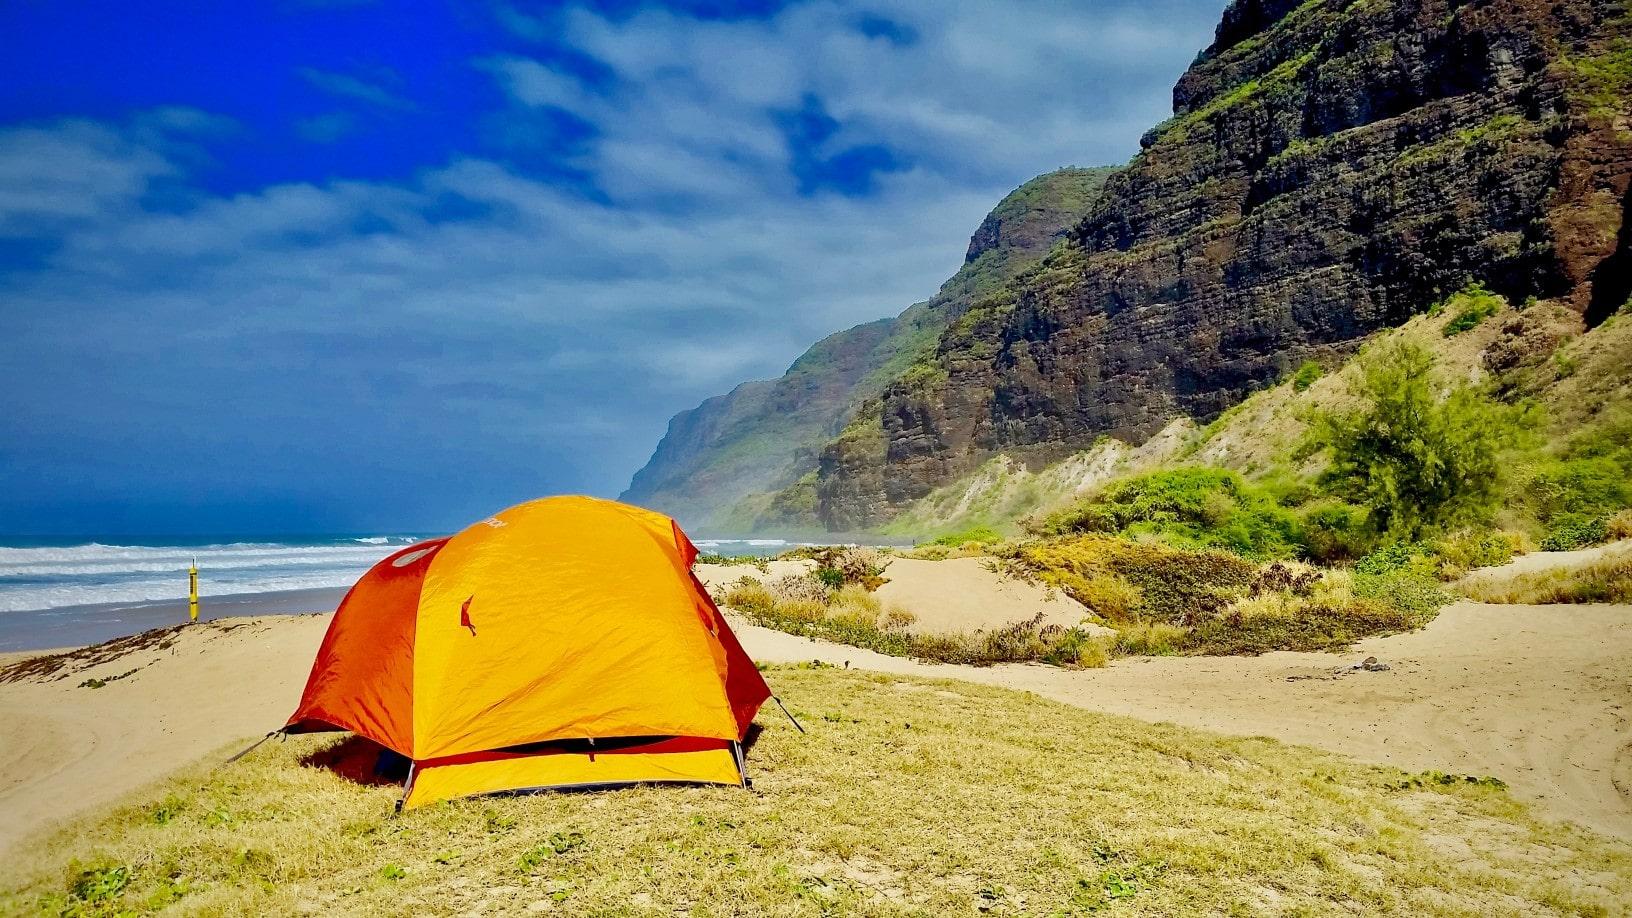 beach camping in usa